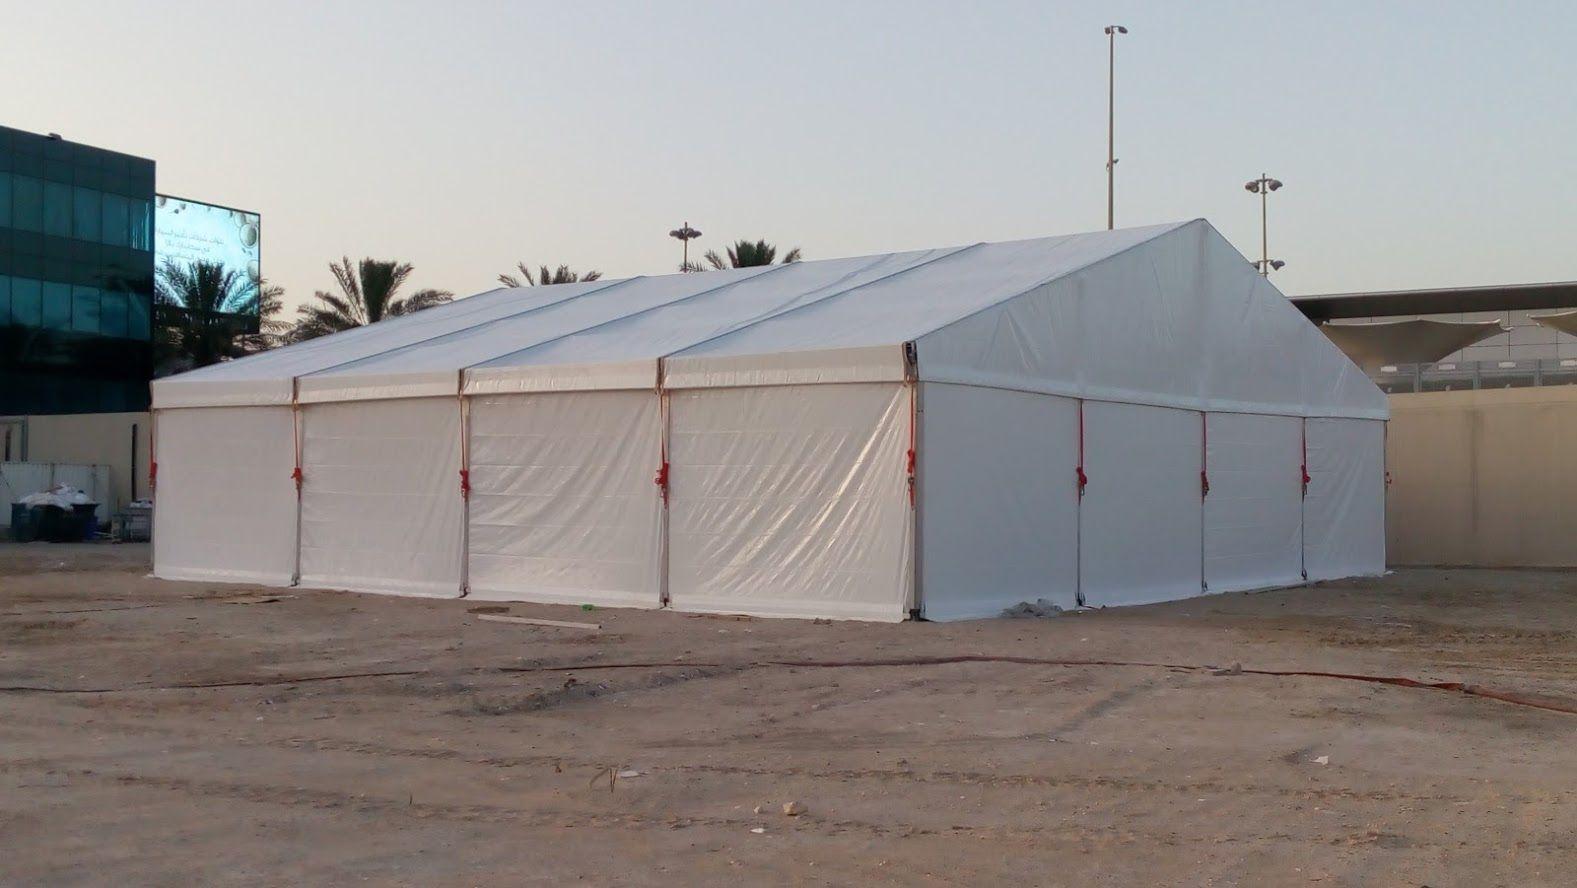 tent suppliers in dubai, tent manufacturers, bedouin tent uae, labour tent uae, canopy manufacturers in dubai, tents and shades, canopy supplier in uae, al fares international tents abu dhabi,